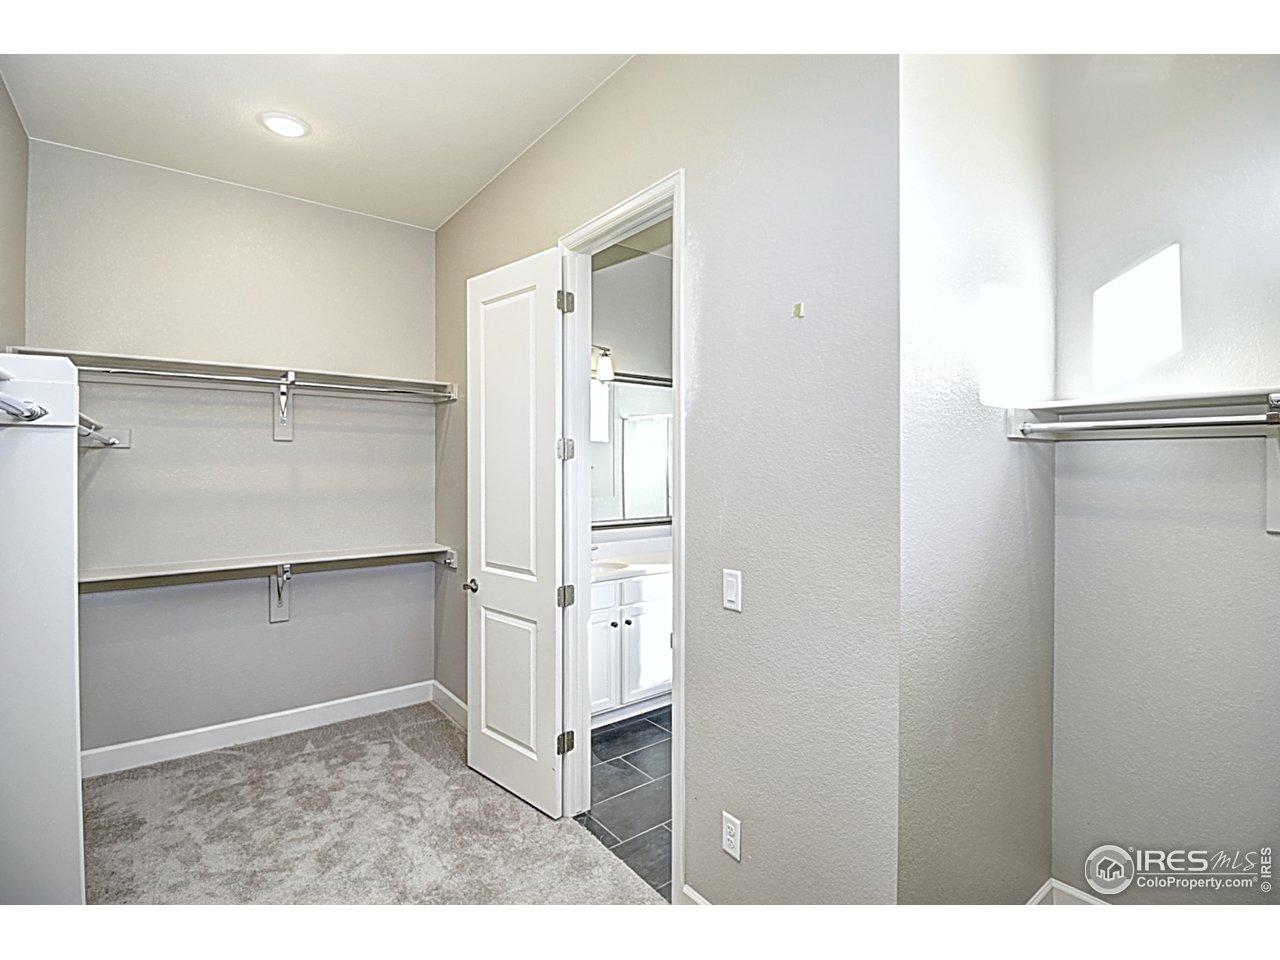 Very large master closet